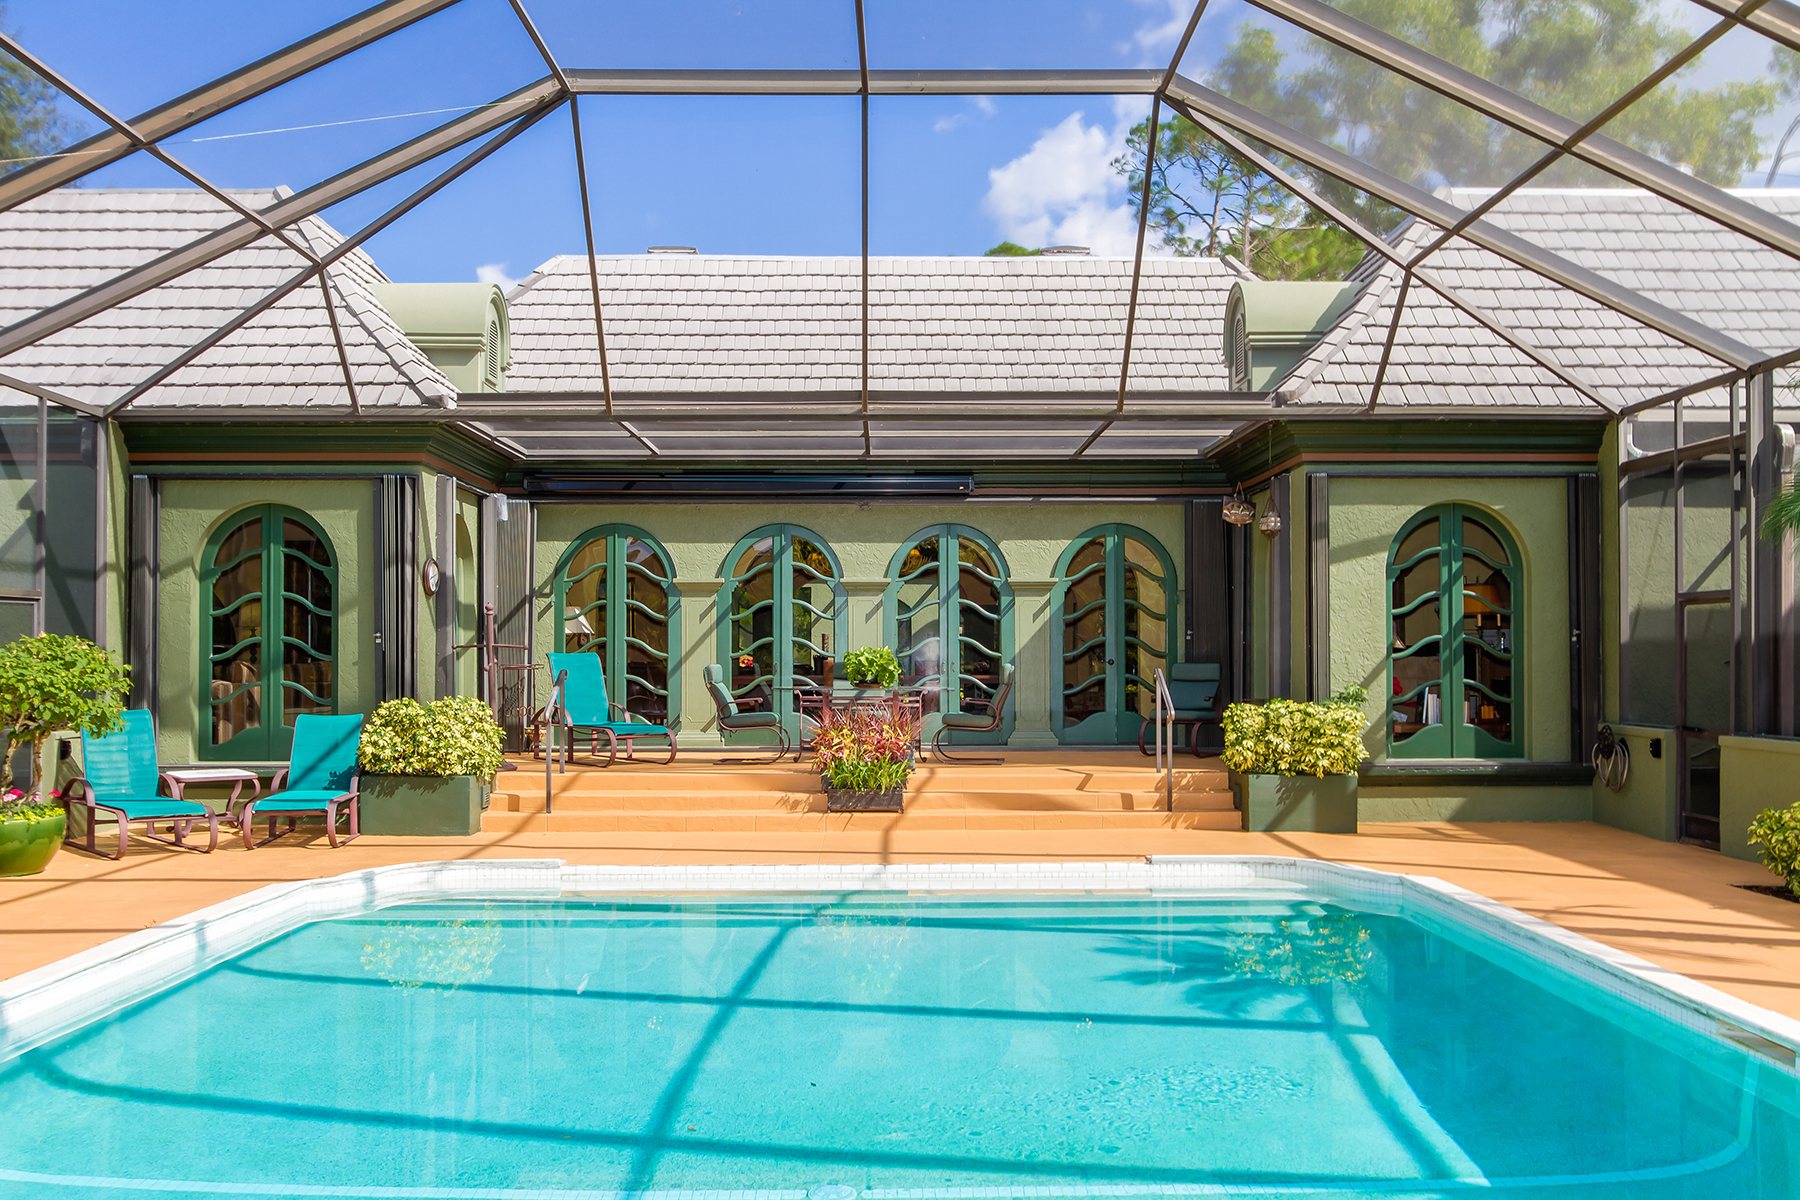 Single Family Home for Sale at QUAIL CREEK 12855 Pond Apple Dr E Quail Creek, Naples, Florida, 34119 United States